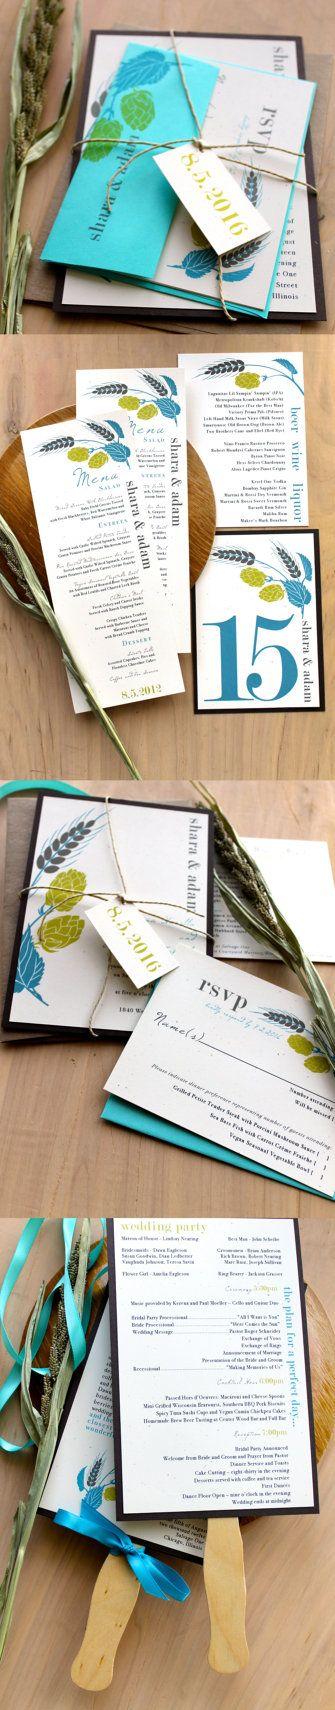 Hops Love  Rustic Wedding Invitations Kraft Hemp by BeaconLane,